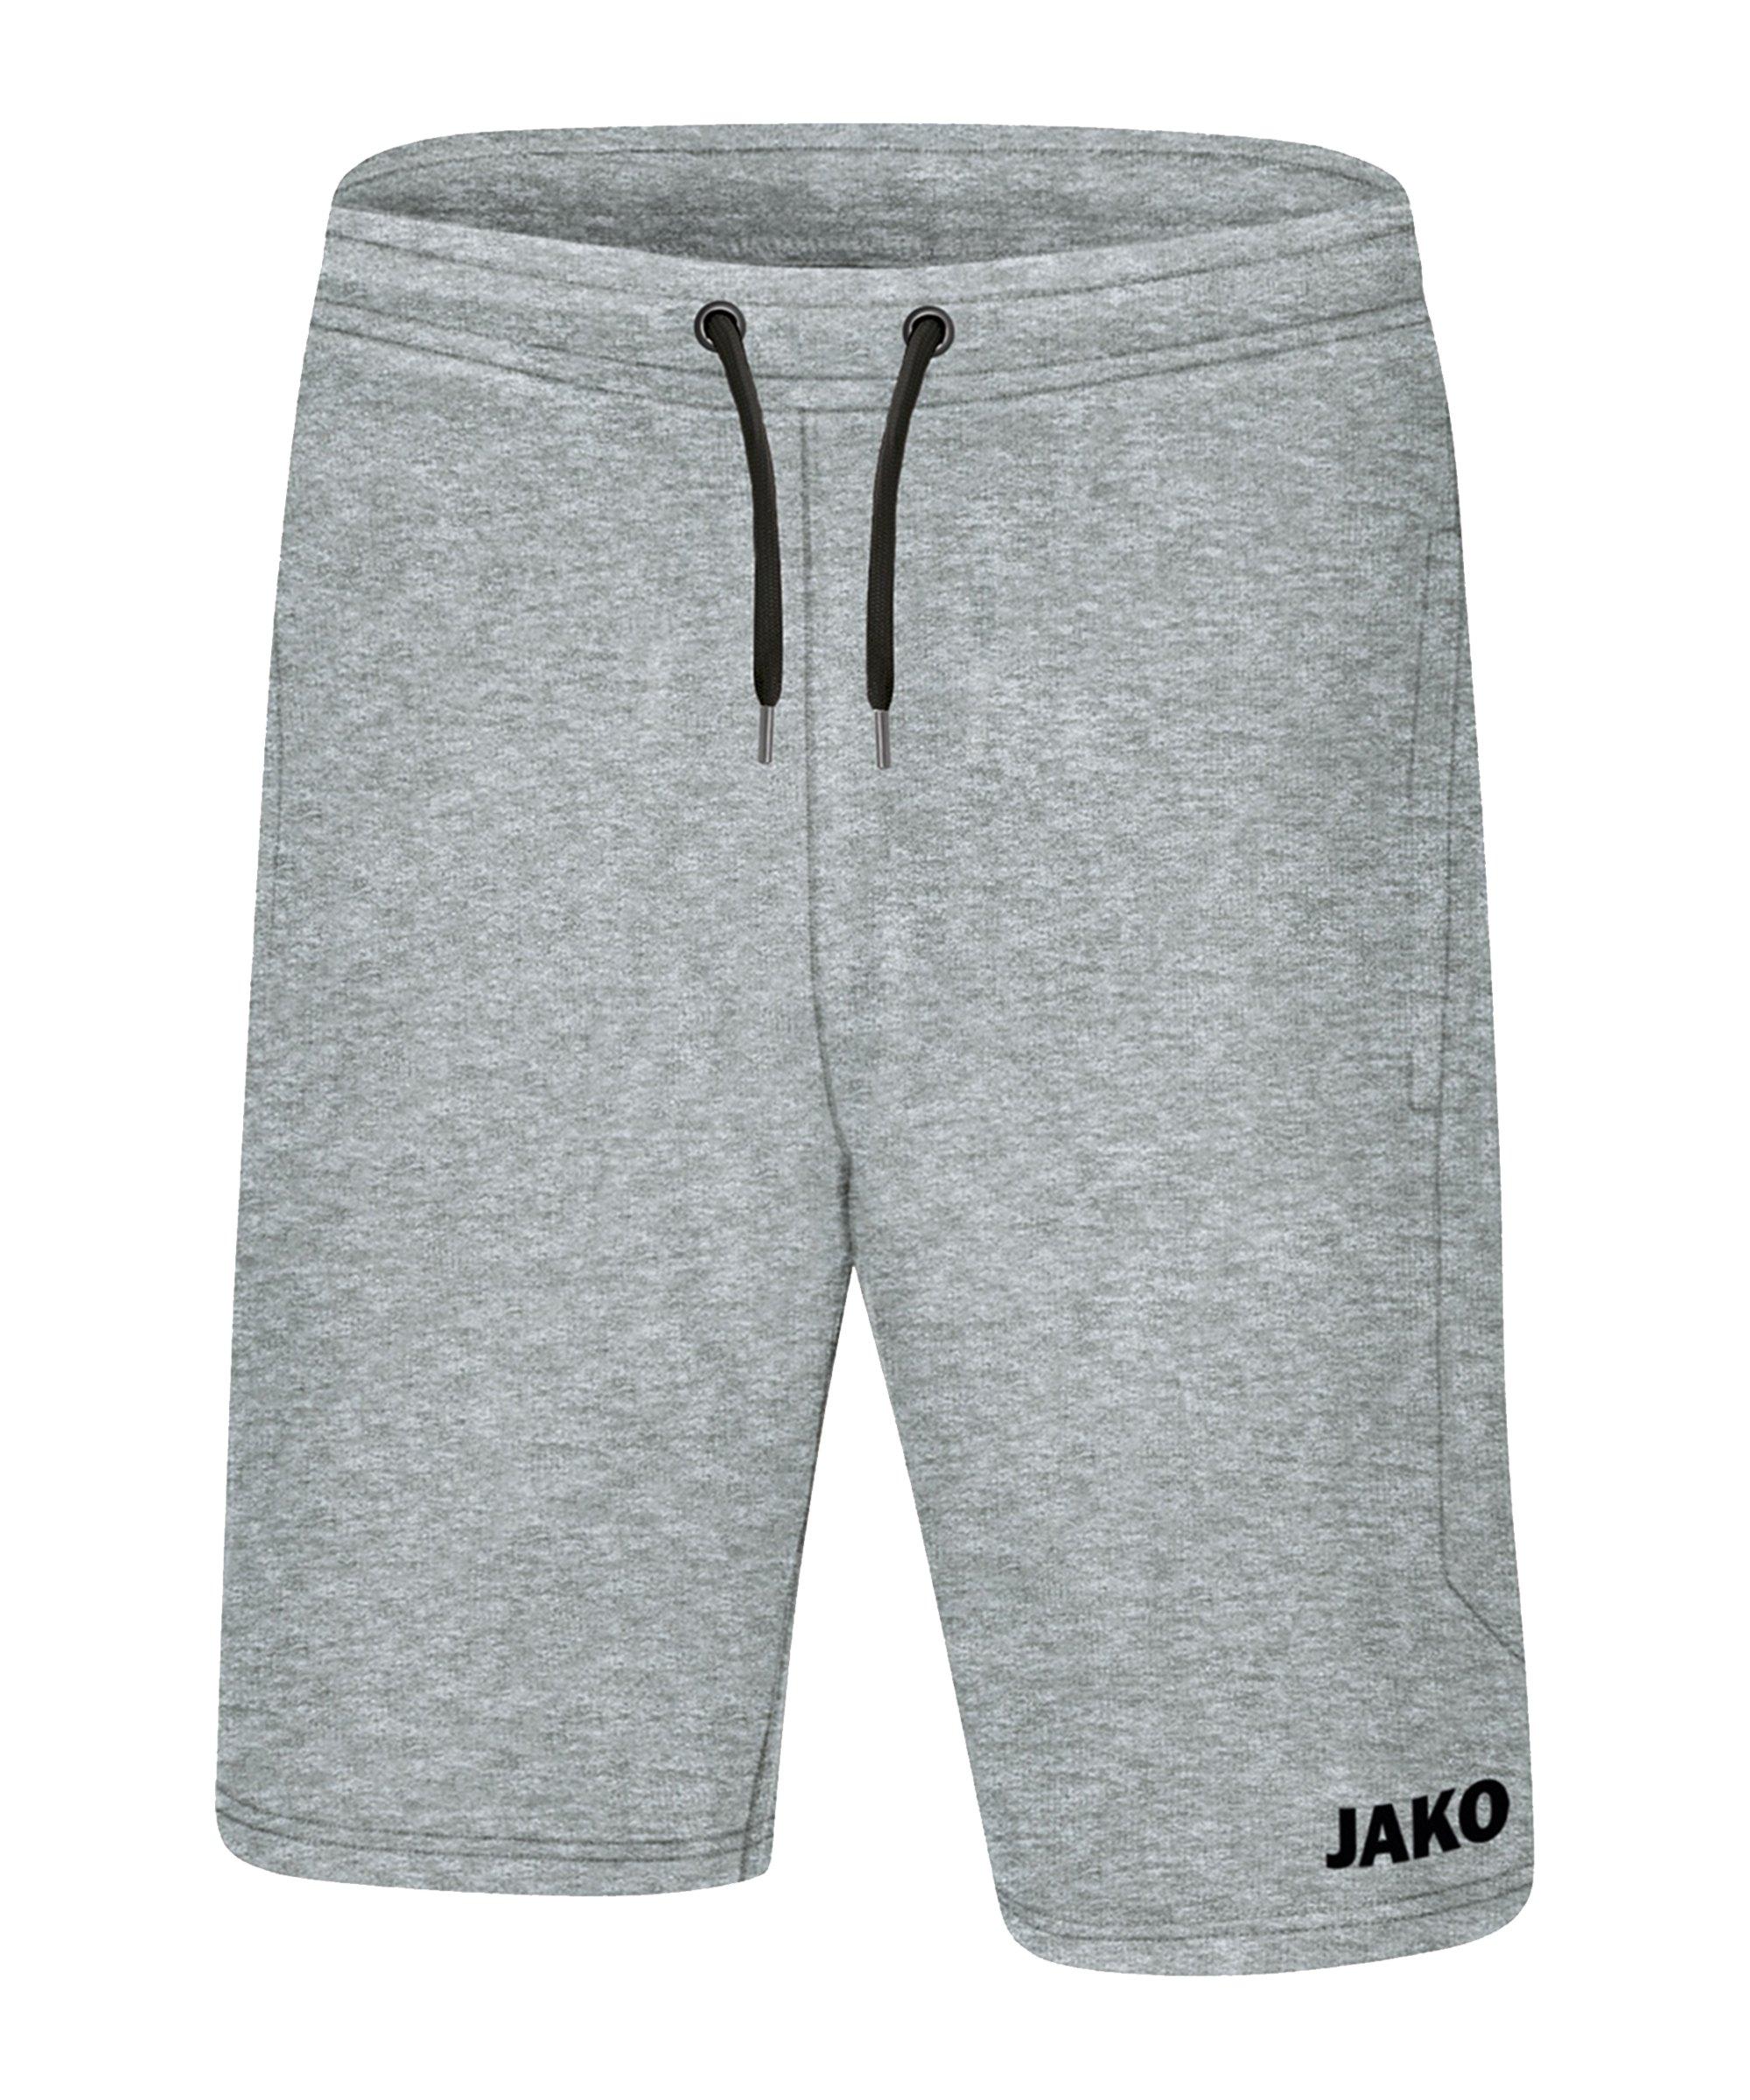 JAKO Base Short Kids Hellgrau F41 - grau